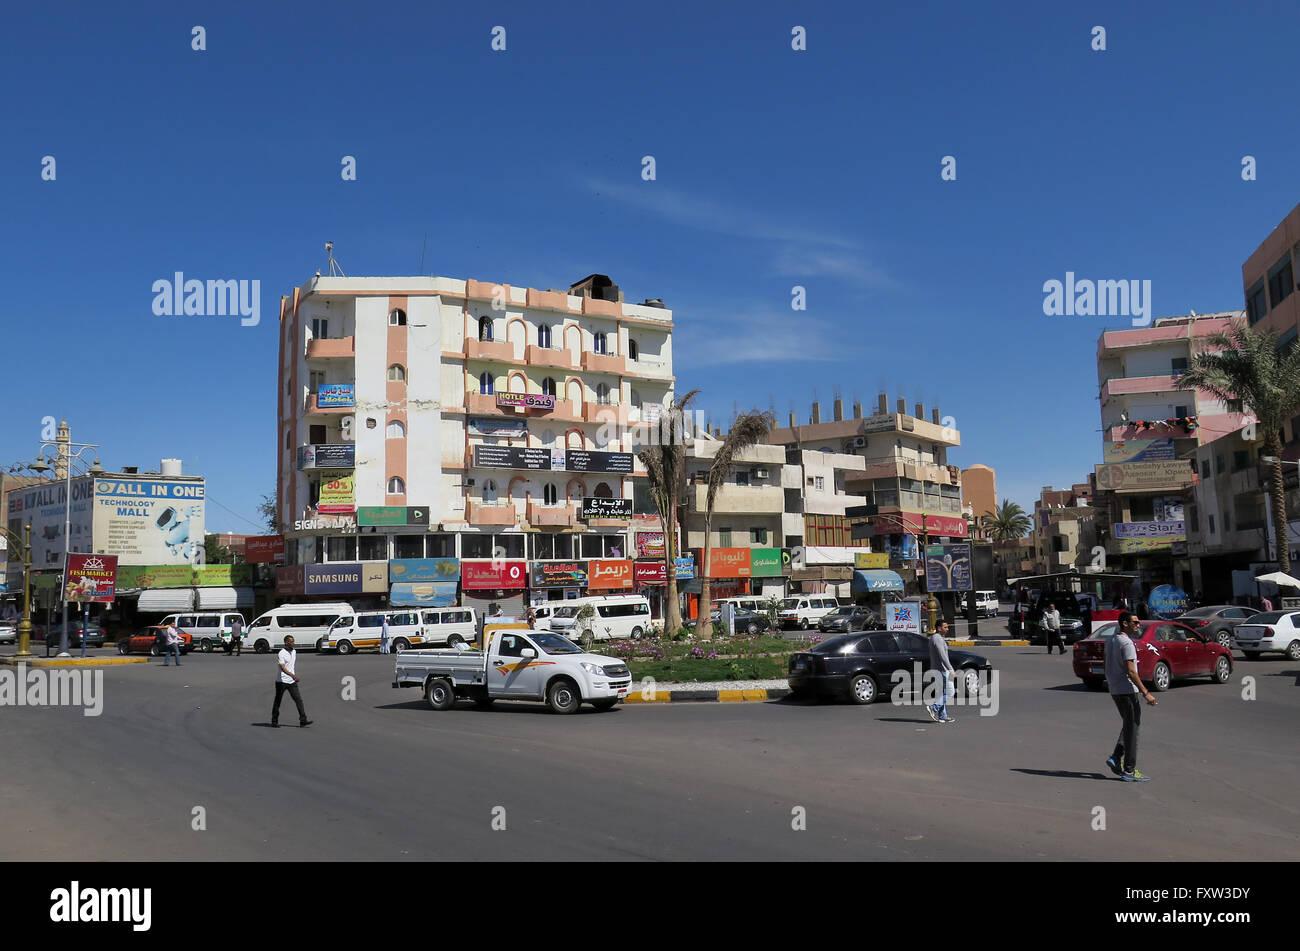 Strassenverkehr, Hurghada, Aegypten Stock Photo